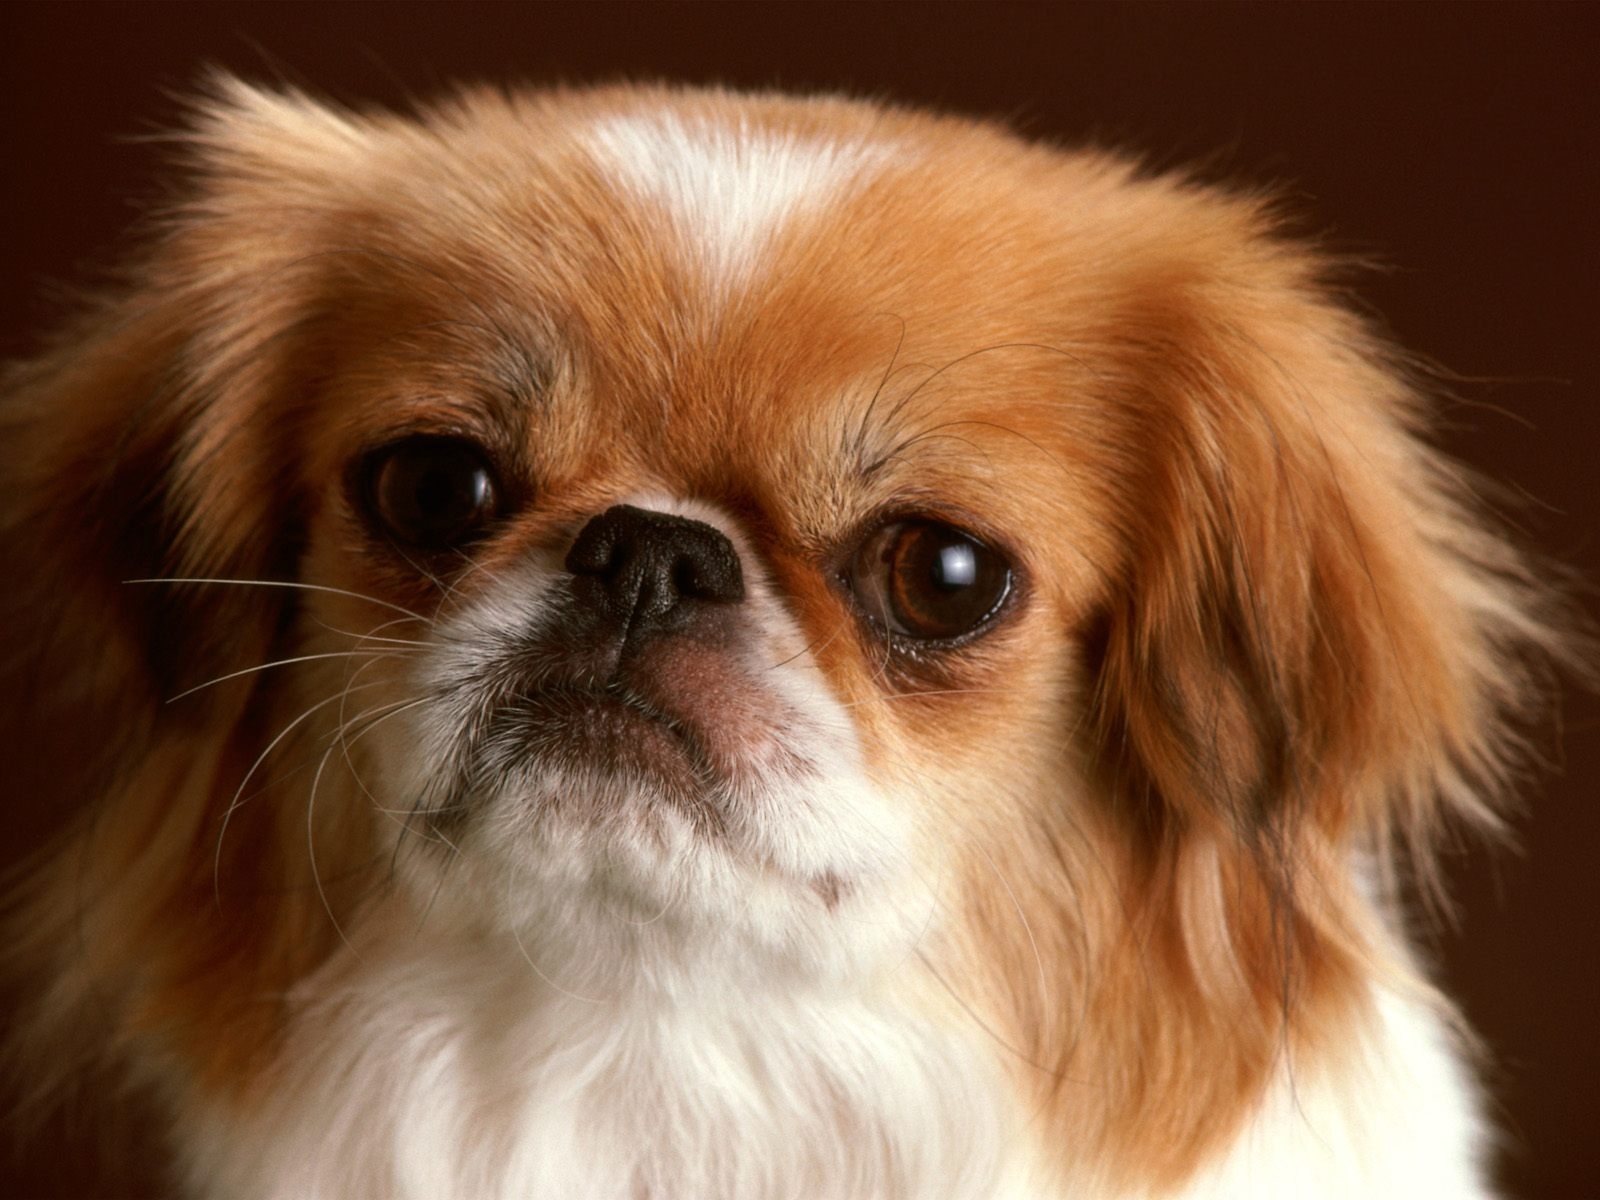 http://3.bp.blogspot.com/-_KRB8ZGoIjo/Ti1ThEog__I/AAAAAAAAAUY/PVk2MubbMmA/s1600/Dog-1.jpg